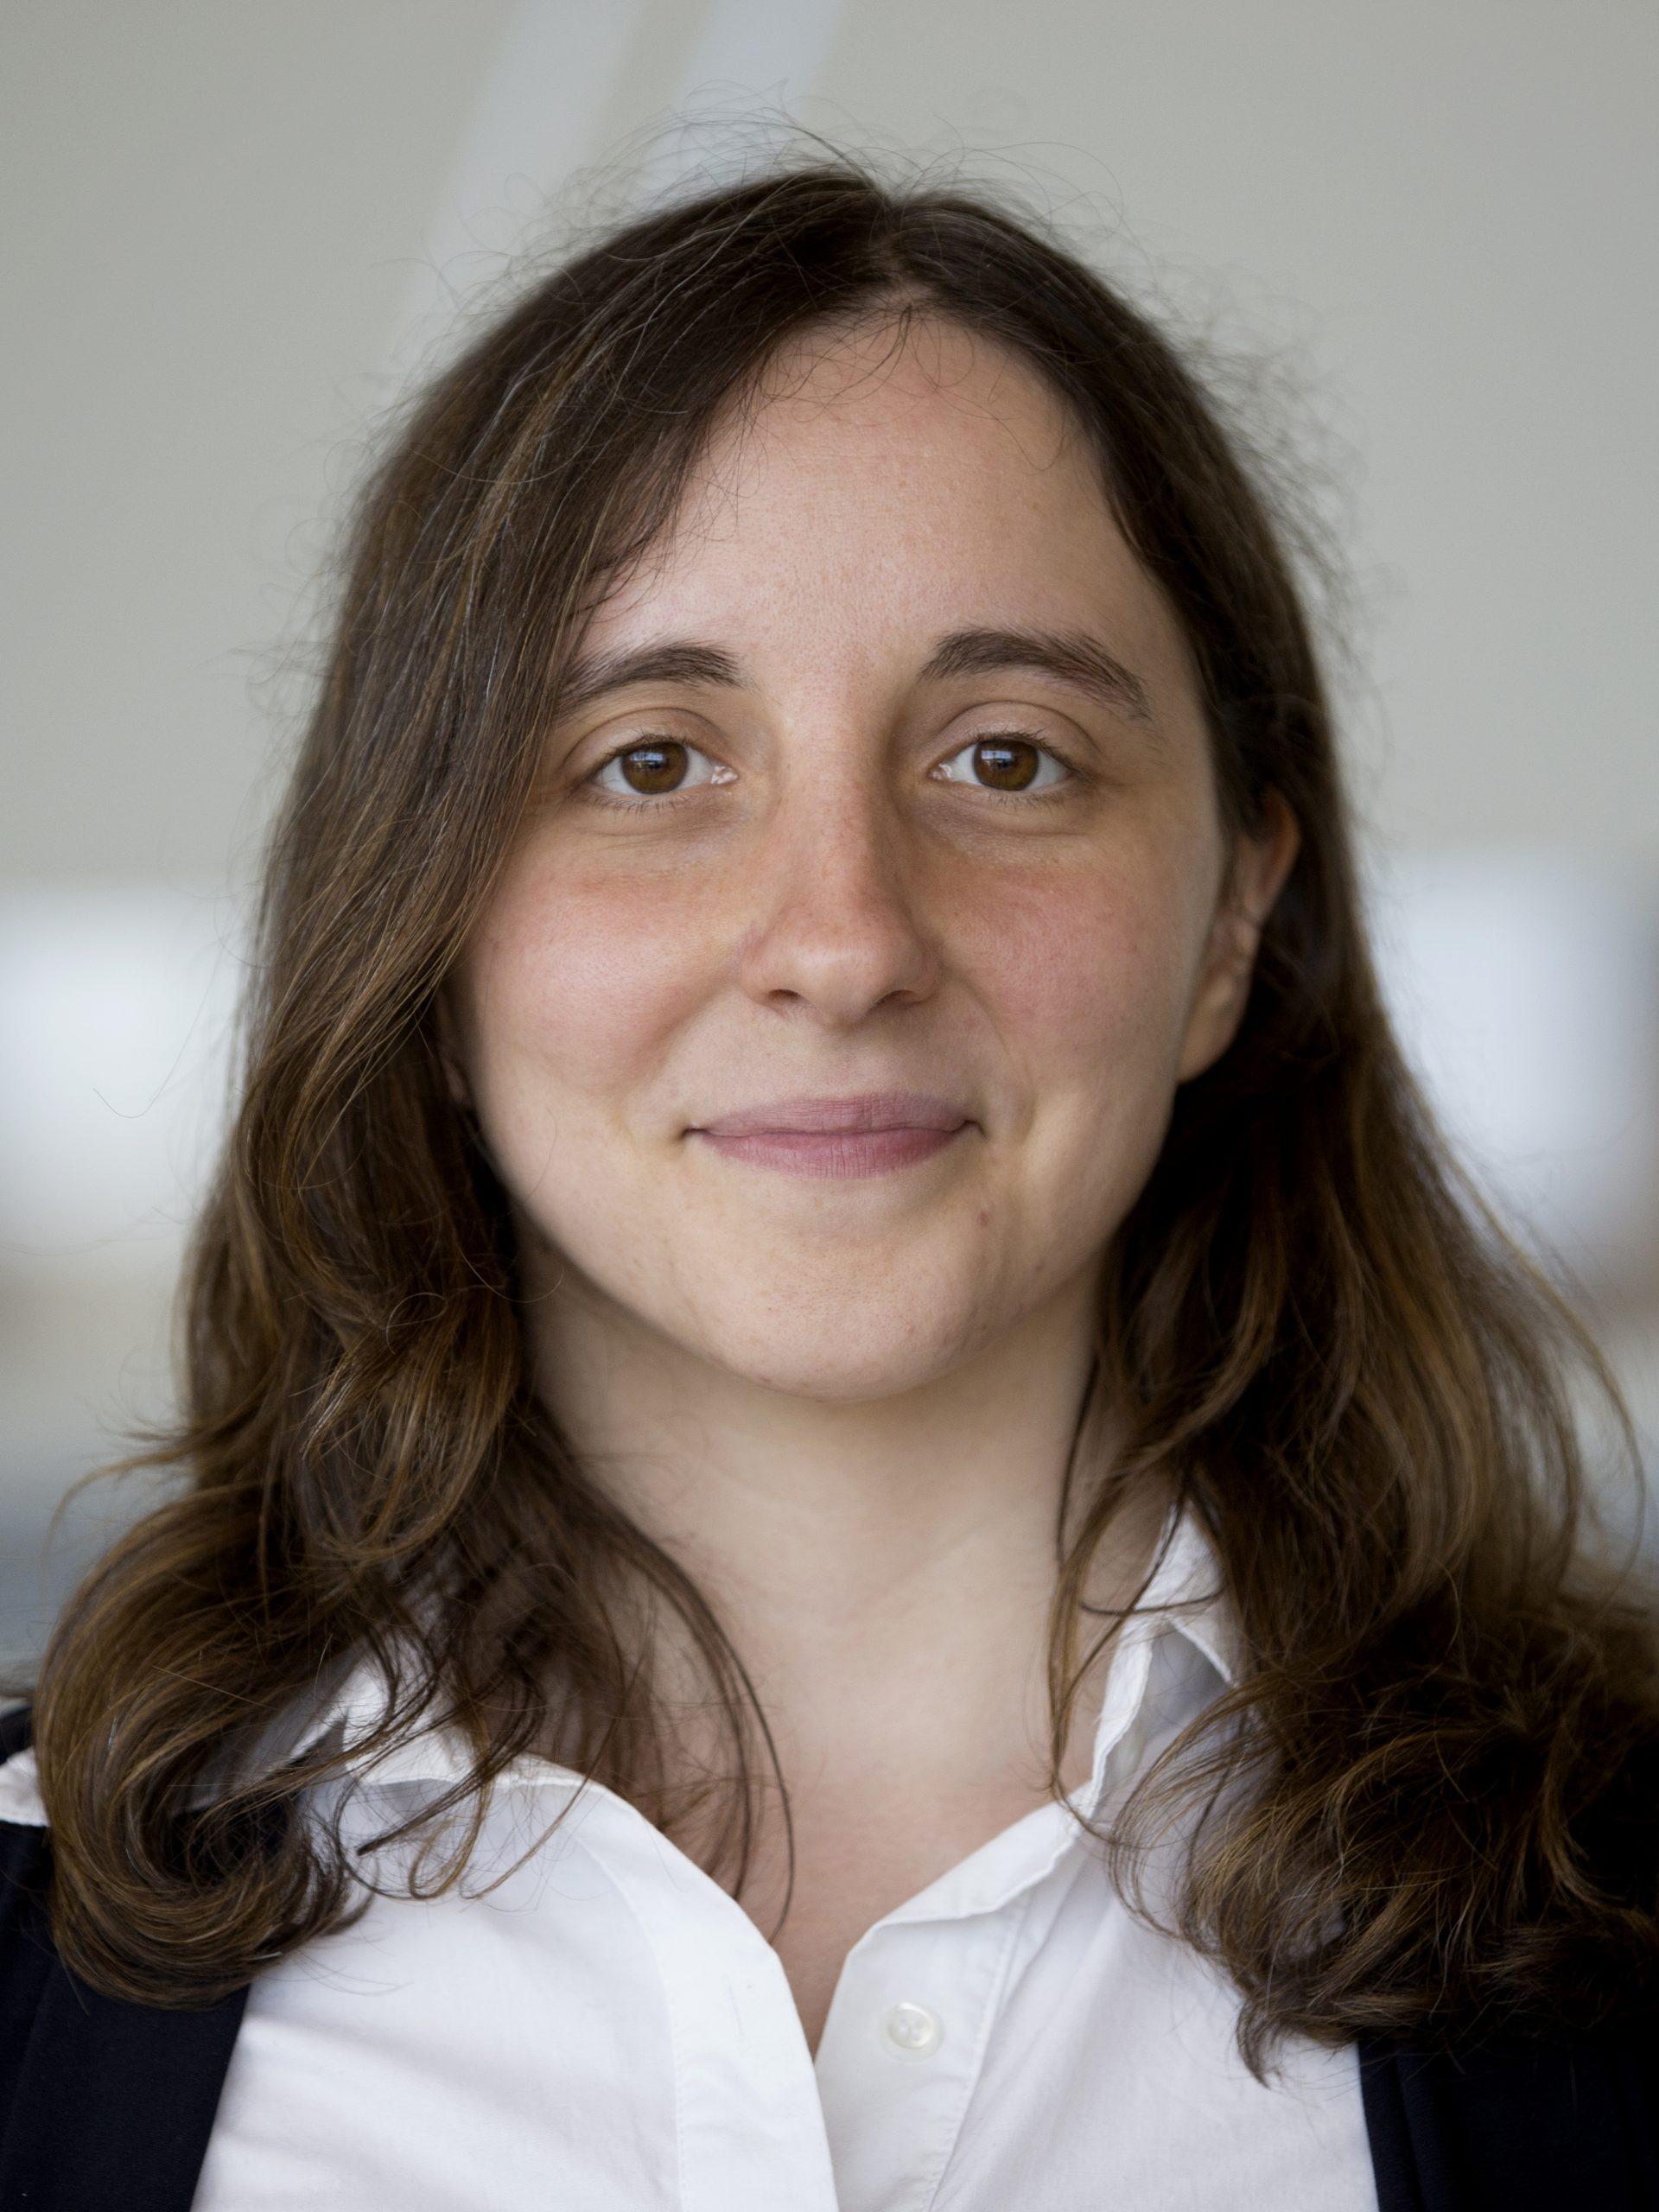 Sara Rampazzi, Ph.D.